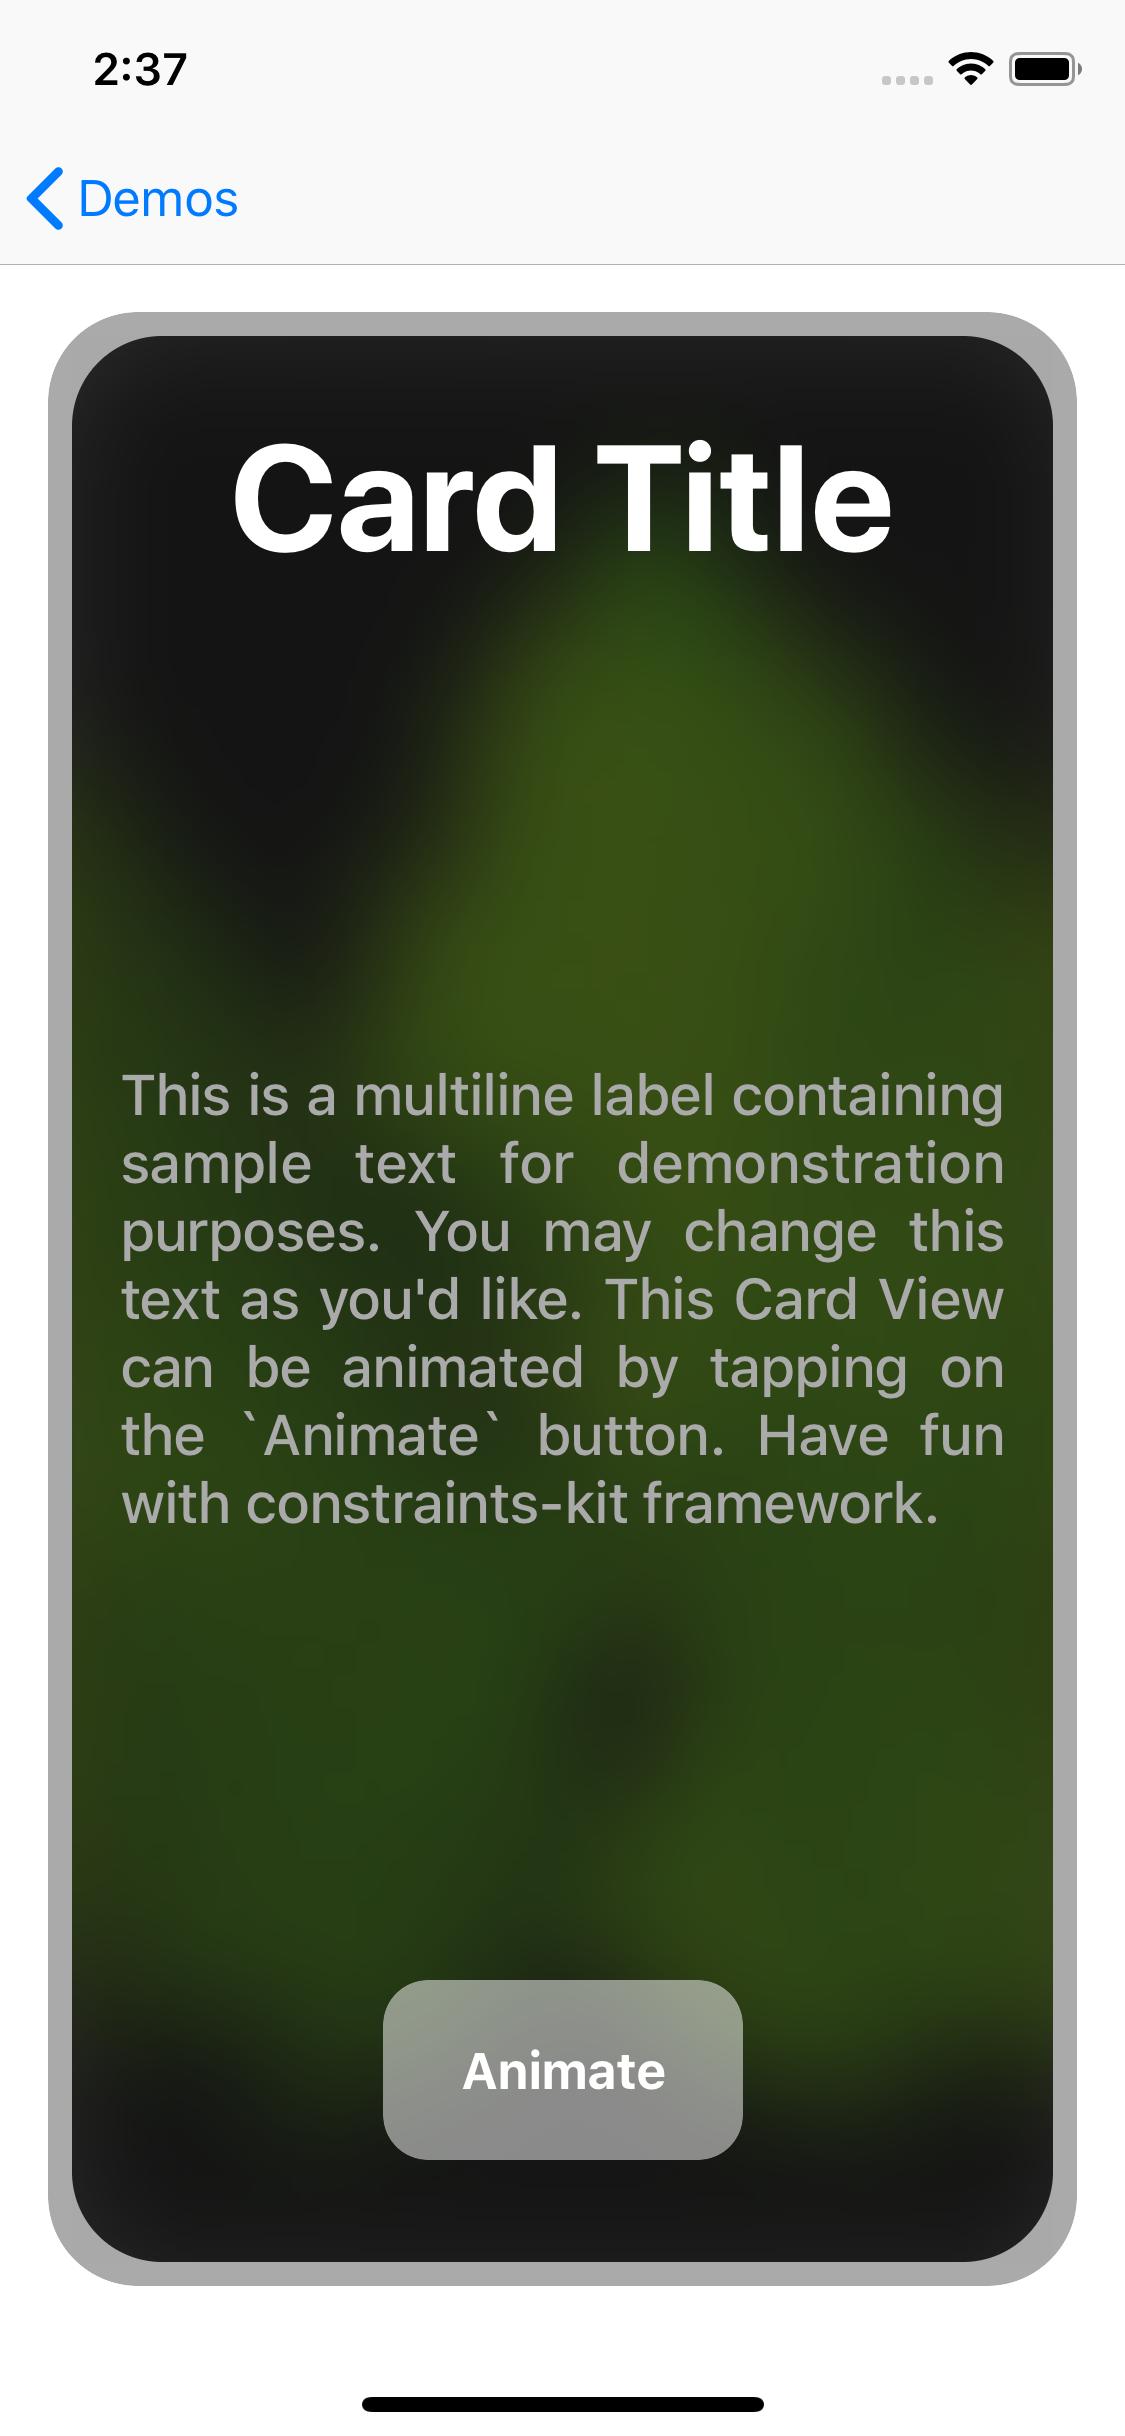 constraints-kit